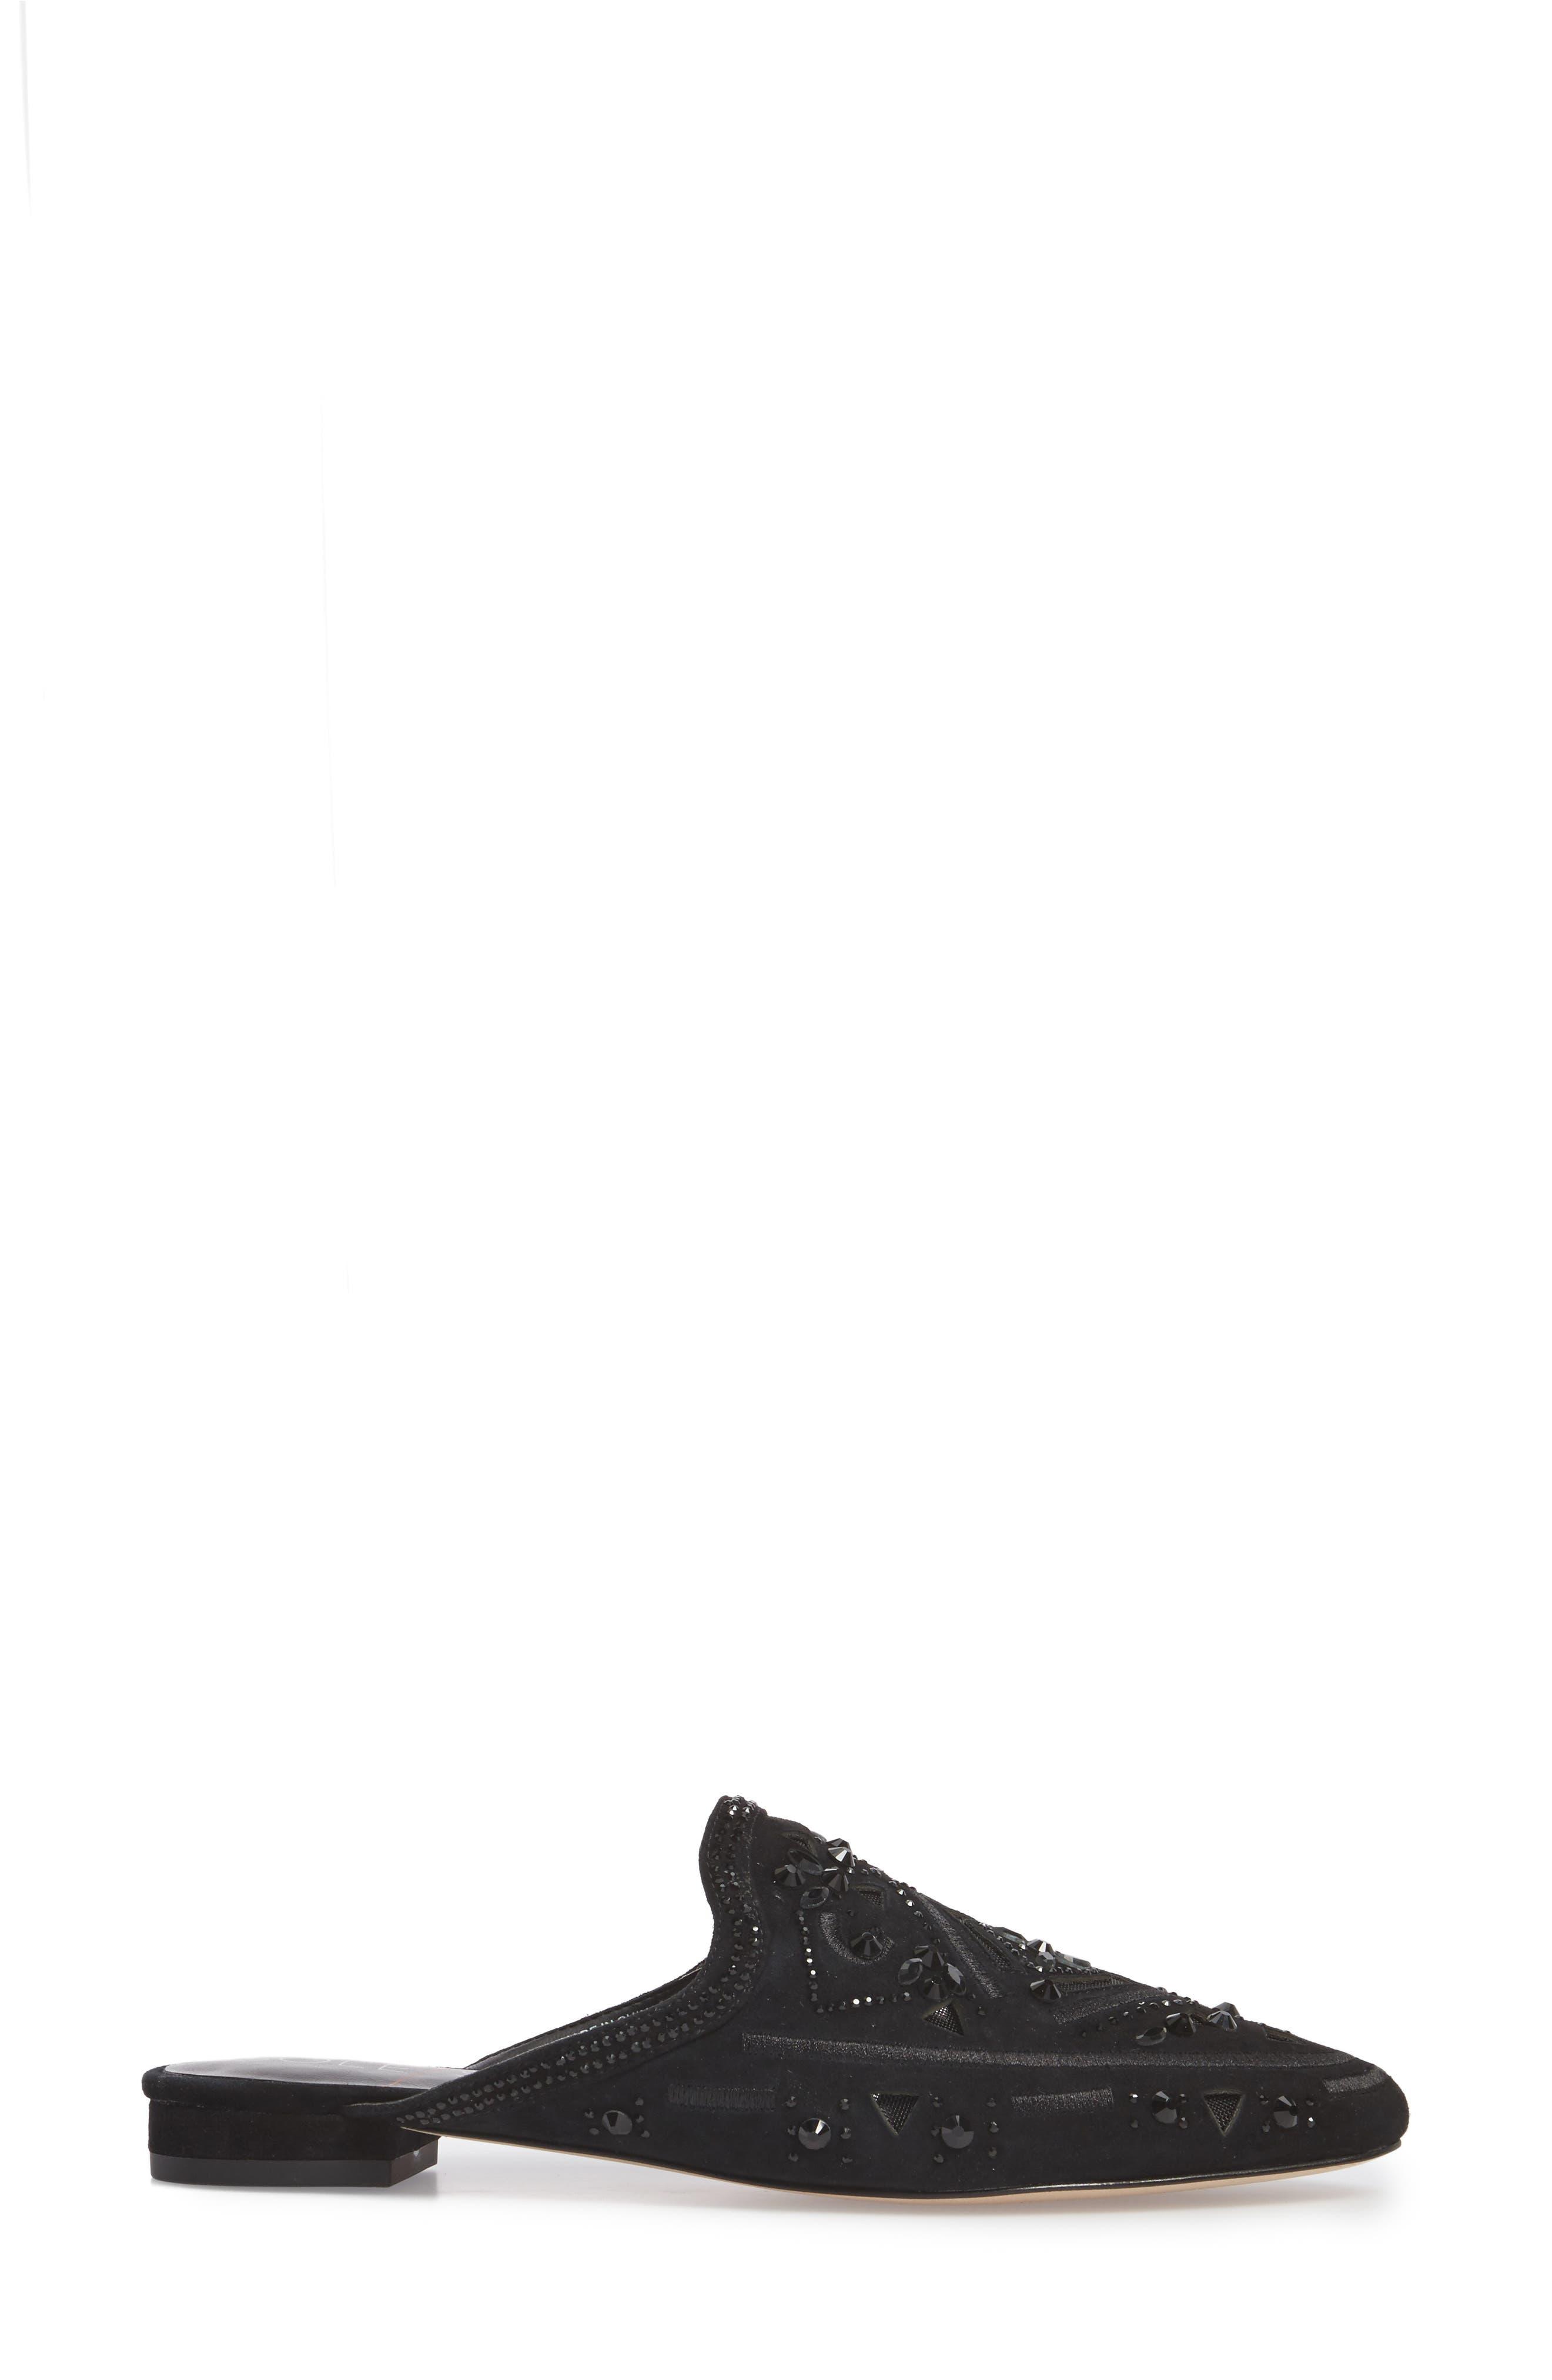 Peace Embellished Loafer Mule,                             Alternate thumbnail 3, color,                             001